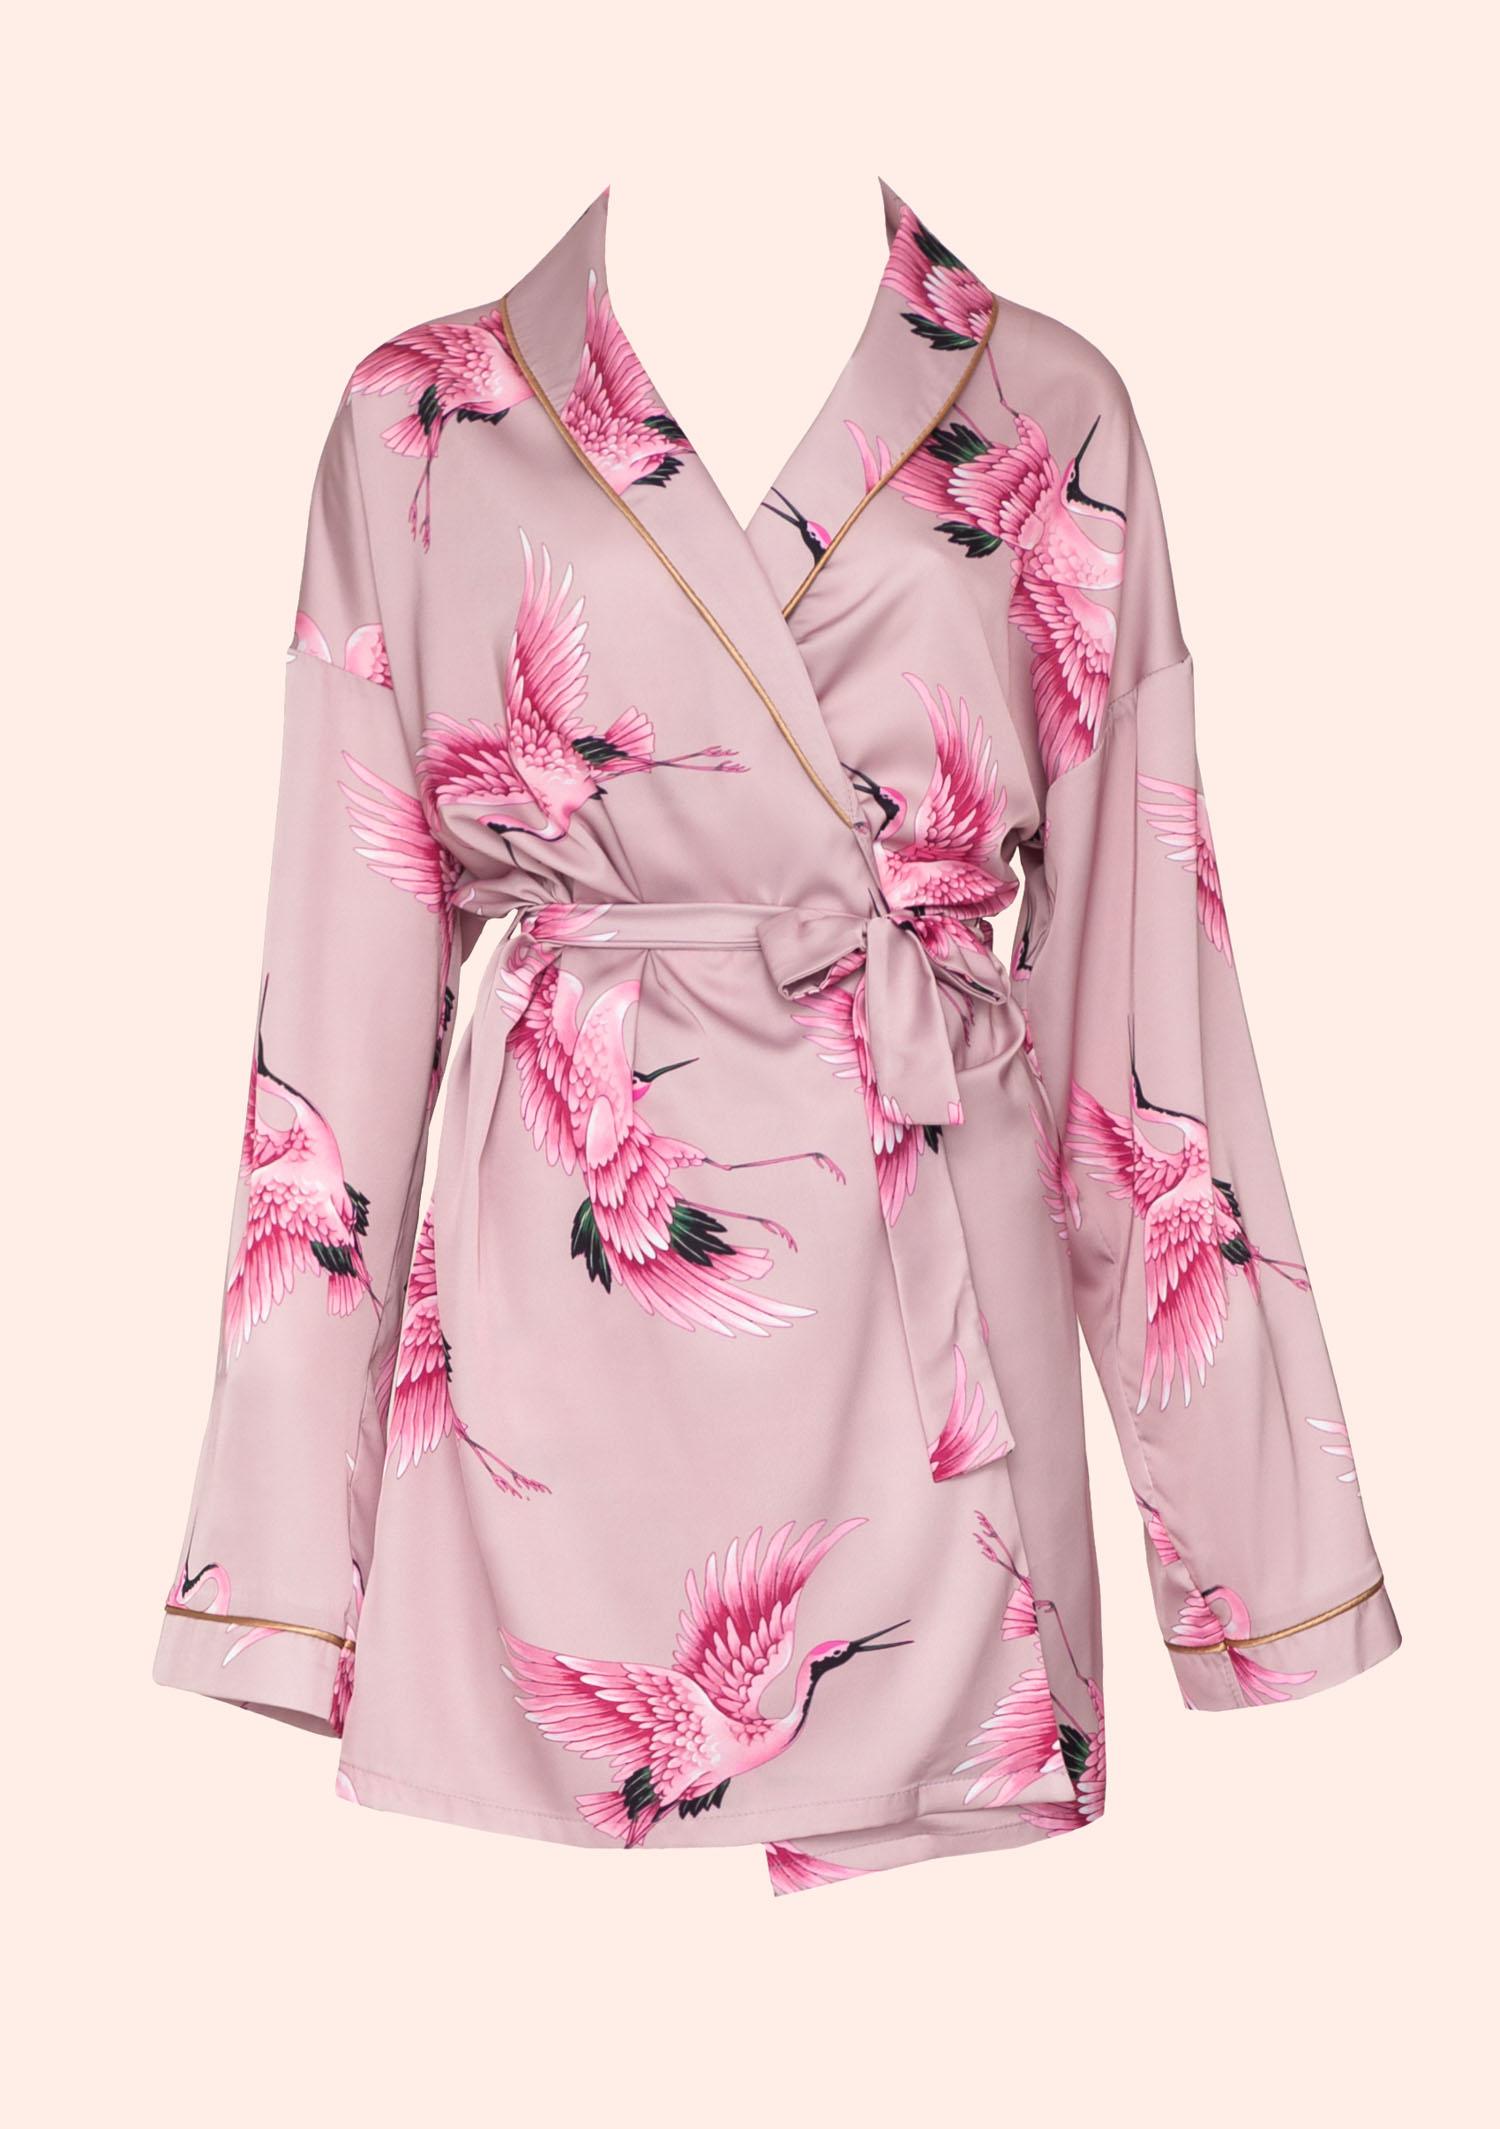 Rose gold bird kimono / pink satin kimono with feathers / classic organic nightgown robe for women / rose elegant long night sleepwear